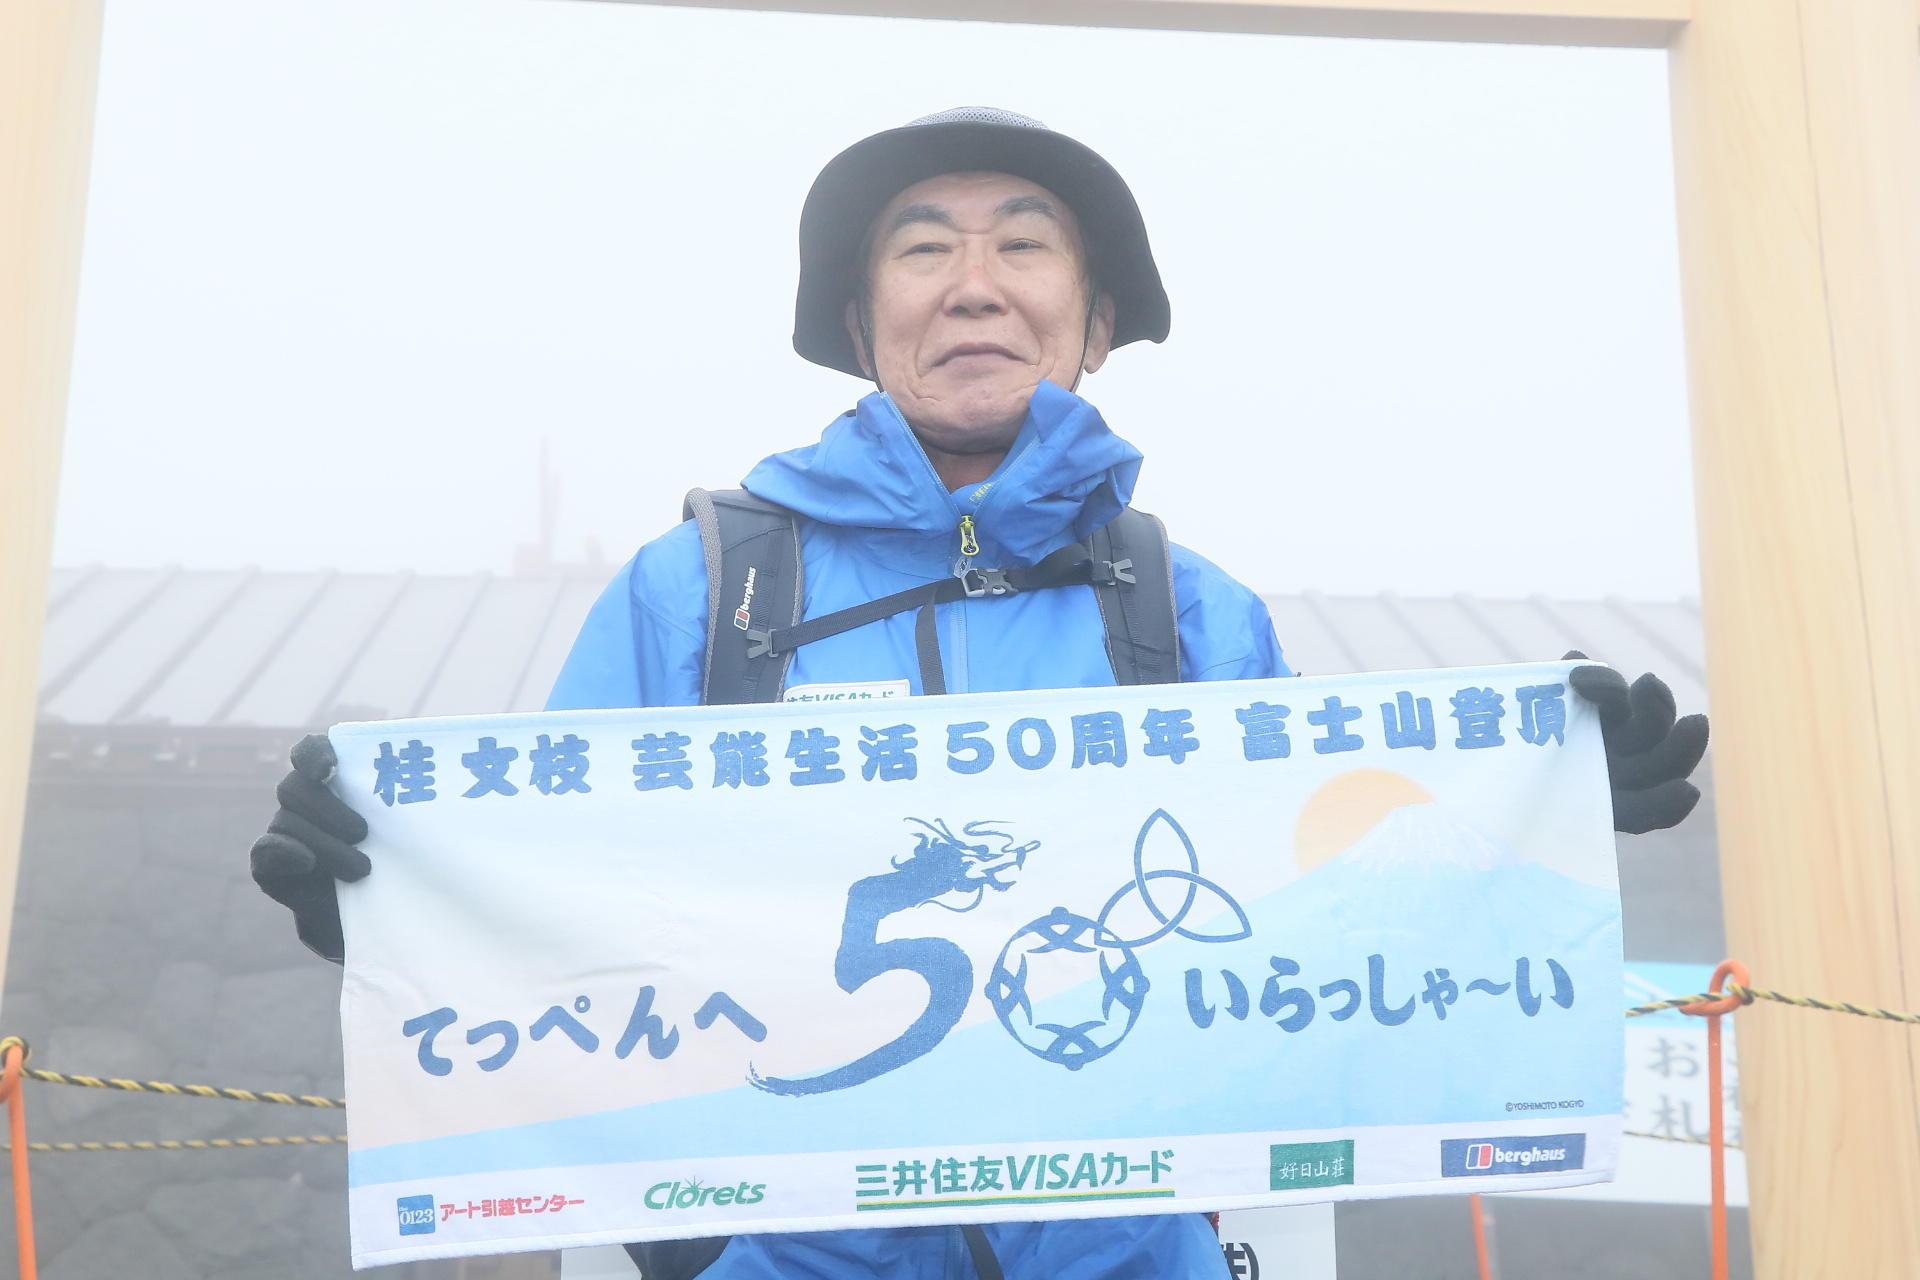 http://news.yoshimoto.co.jp/20170714100947-ff2cca8662b043c987d49ba2ede70cf19aeebe30.jpg